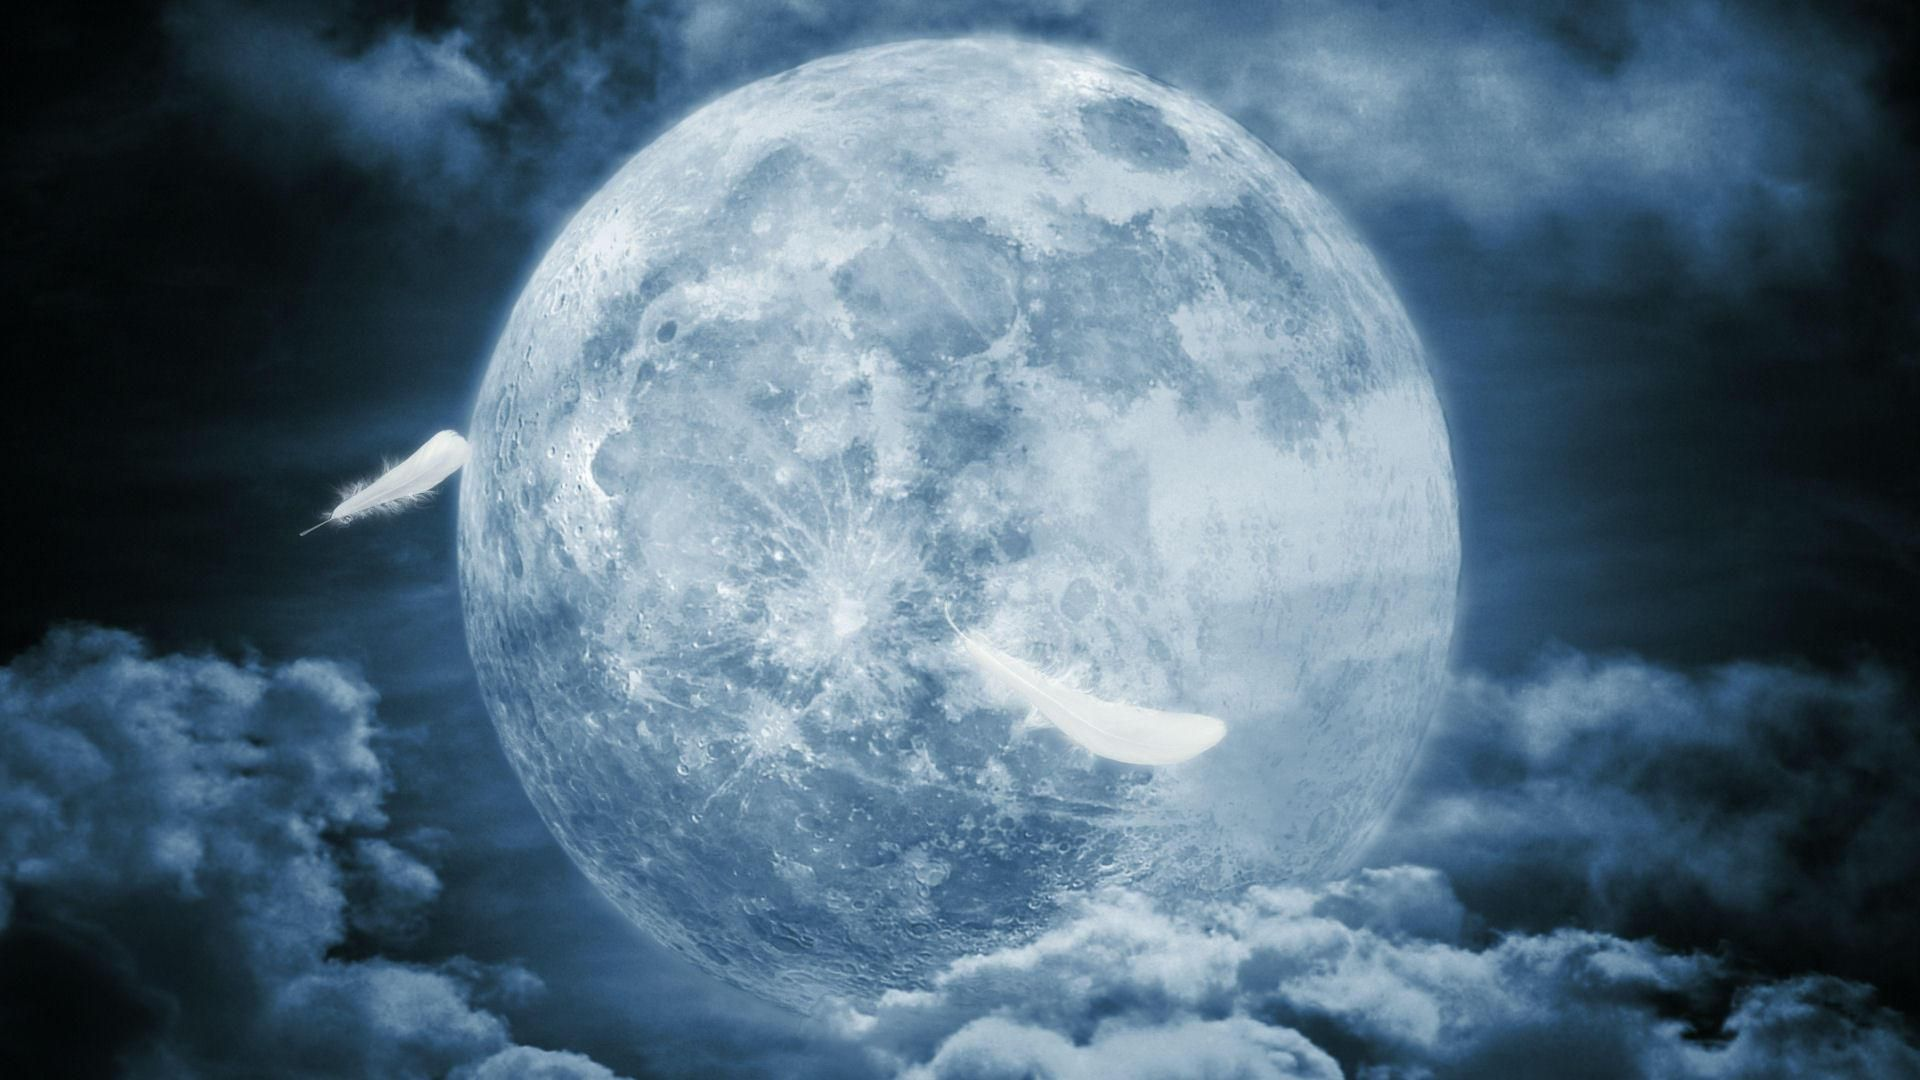 Moon good wallpaper hd